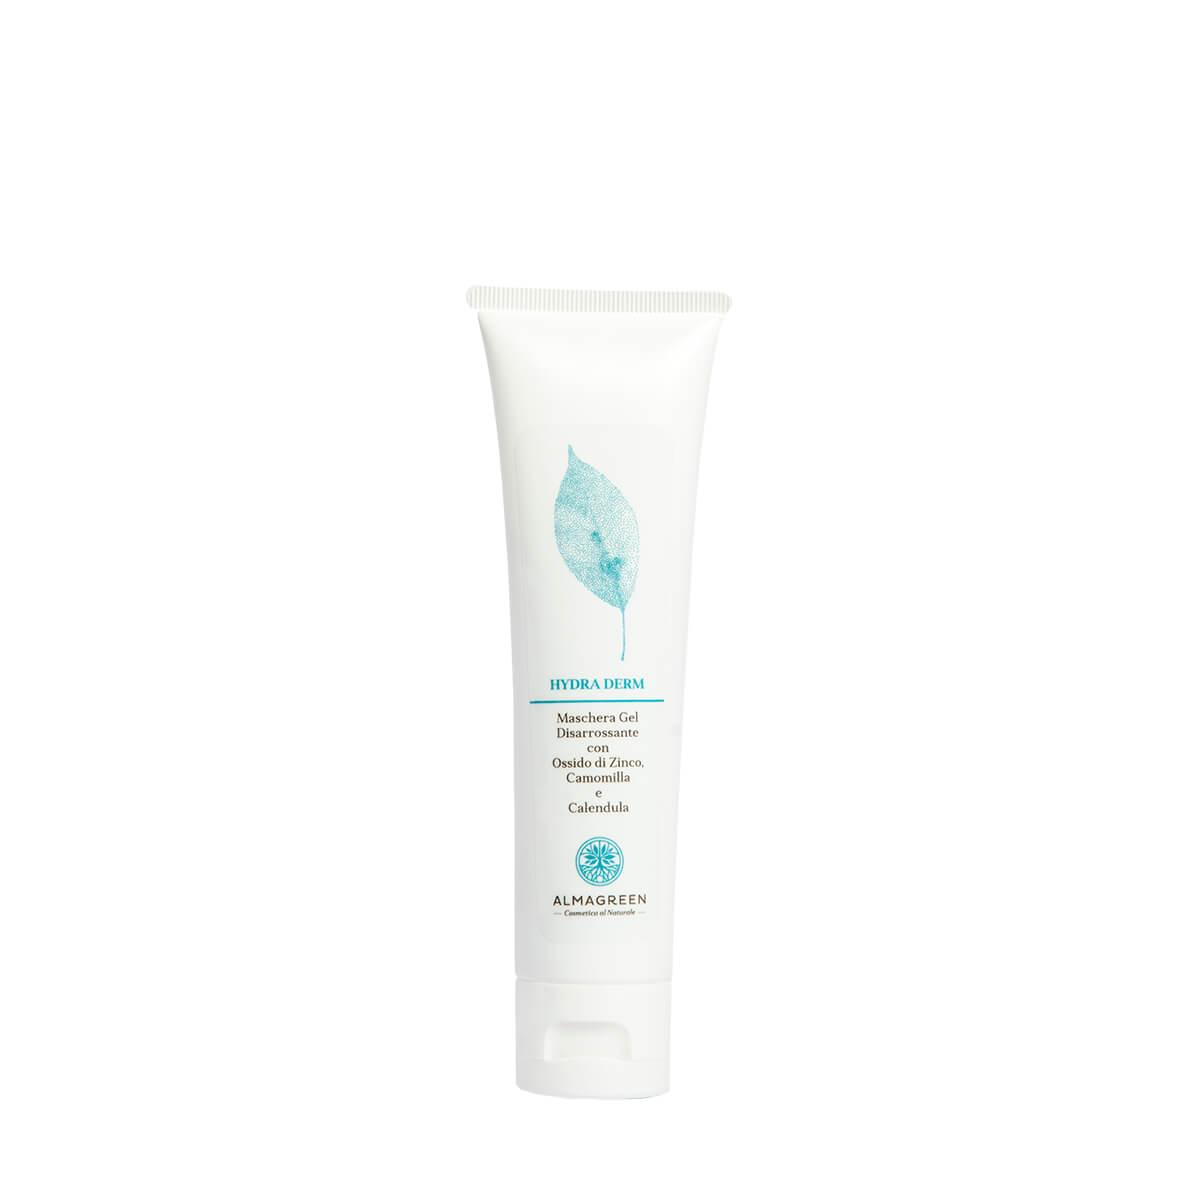 Maschera gel viso anti arrossamento - Almagreen - Cosmetica al Naturale